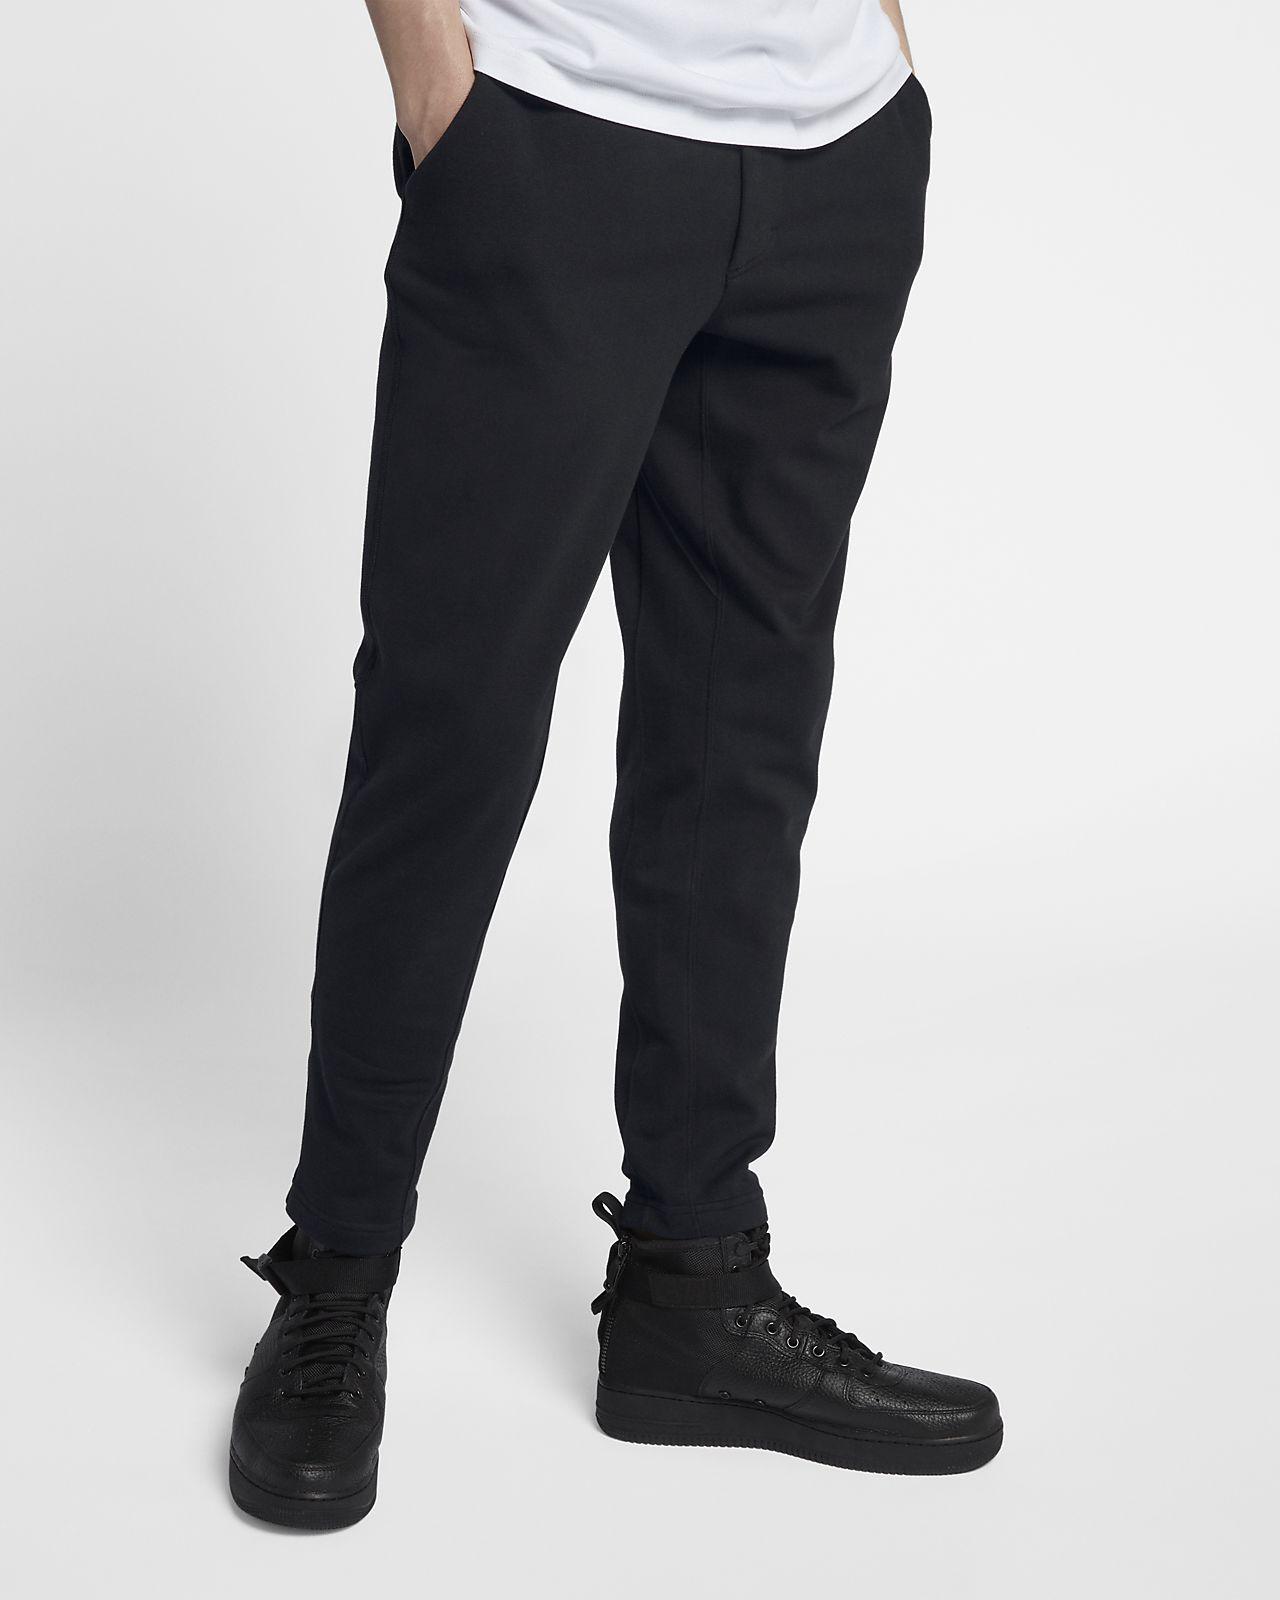 NikeLab Collection Men's Fleece Trousers